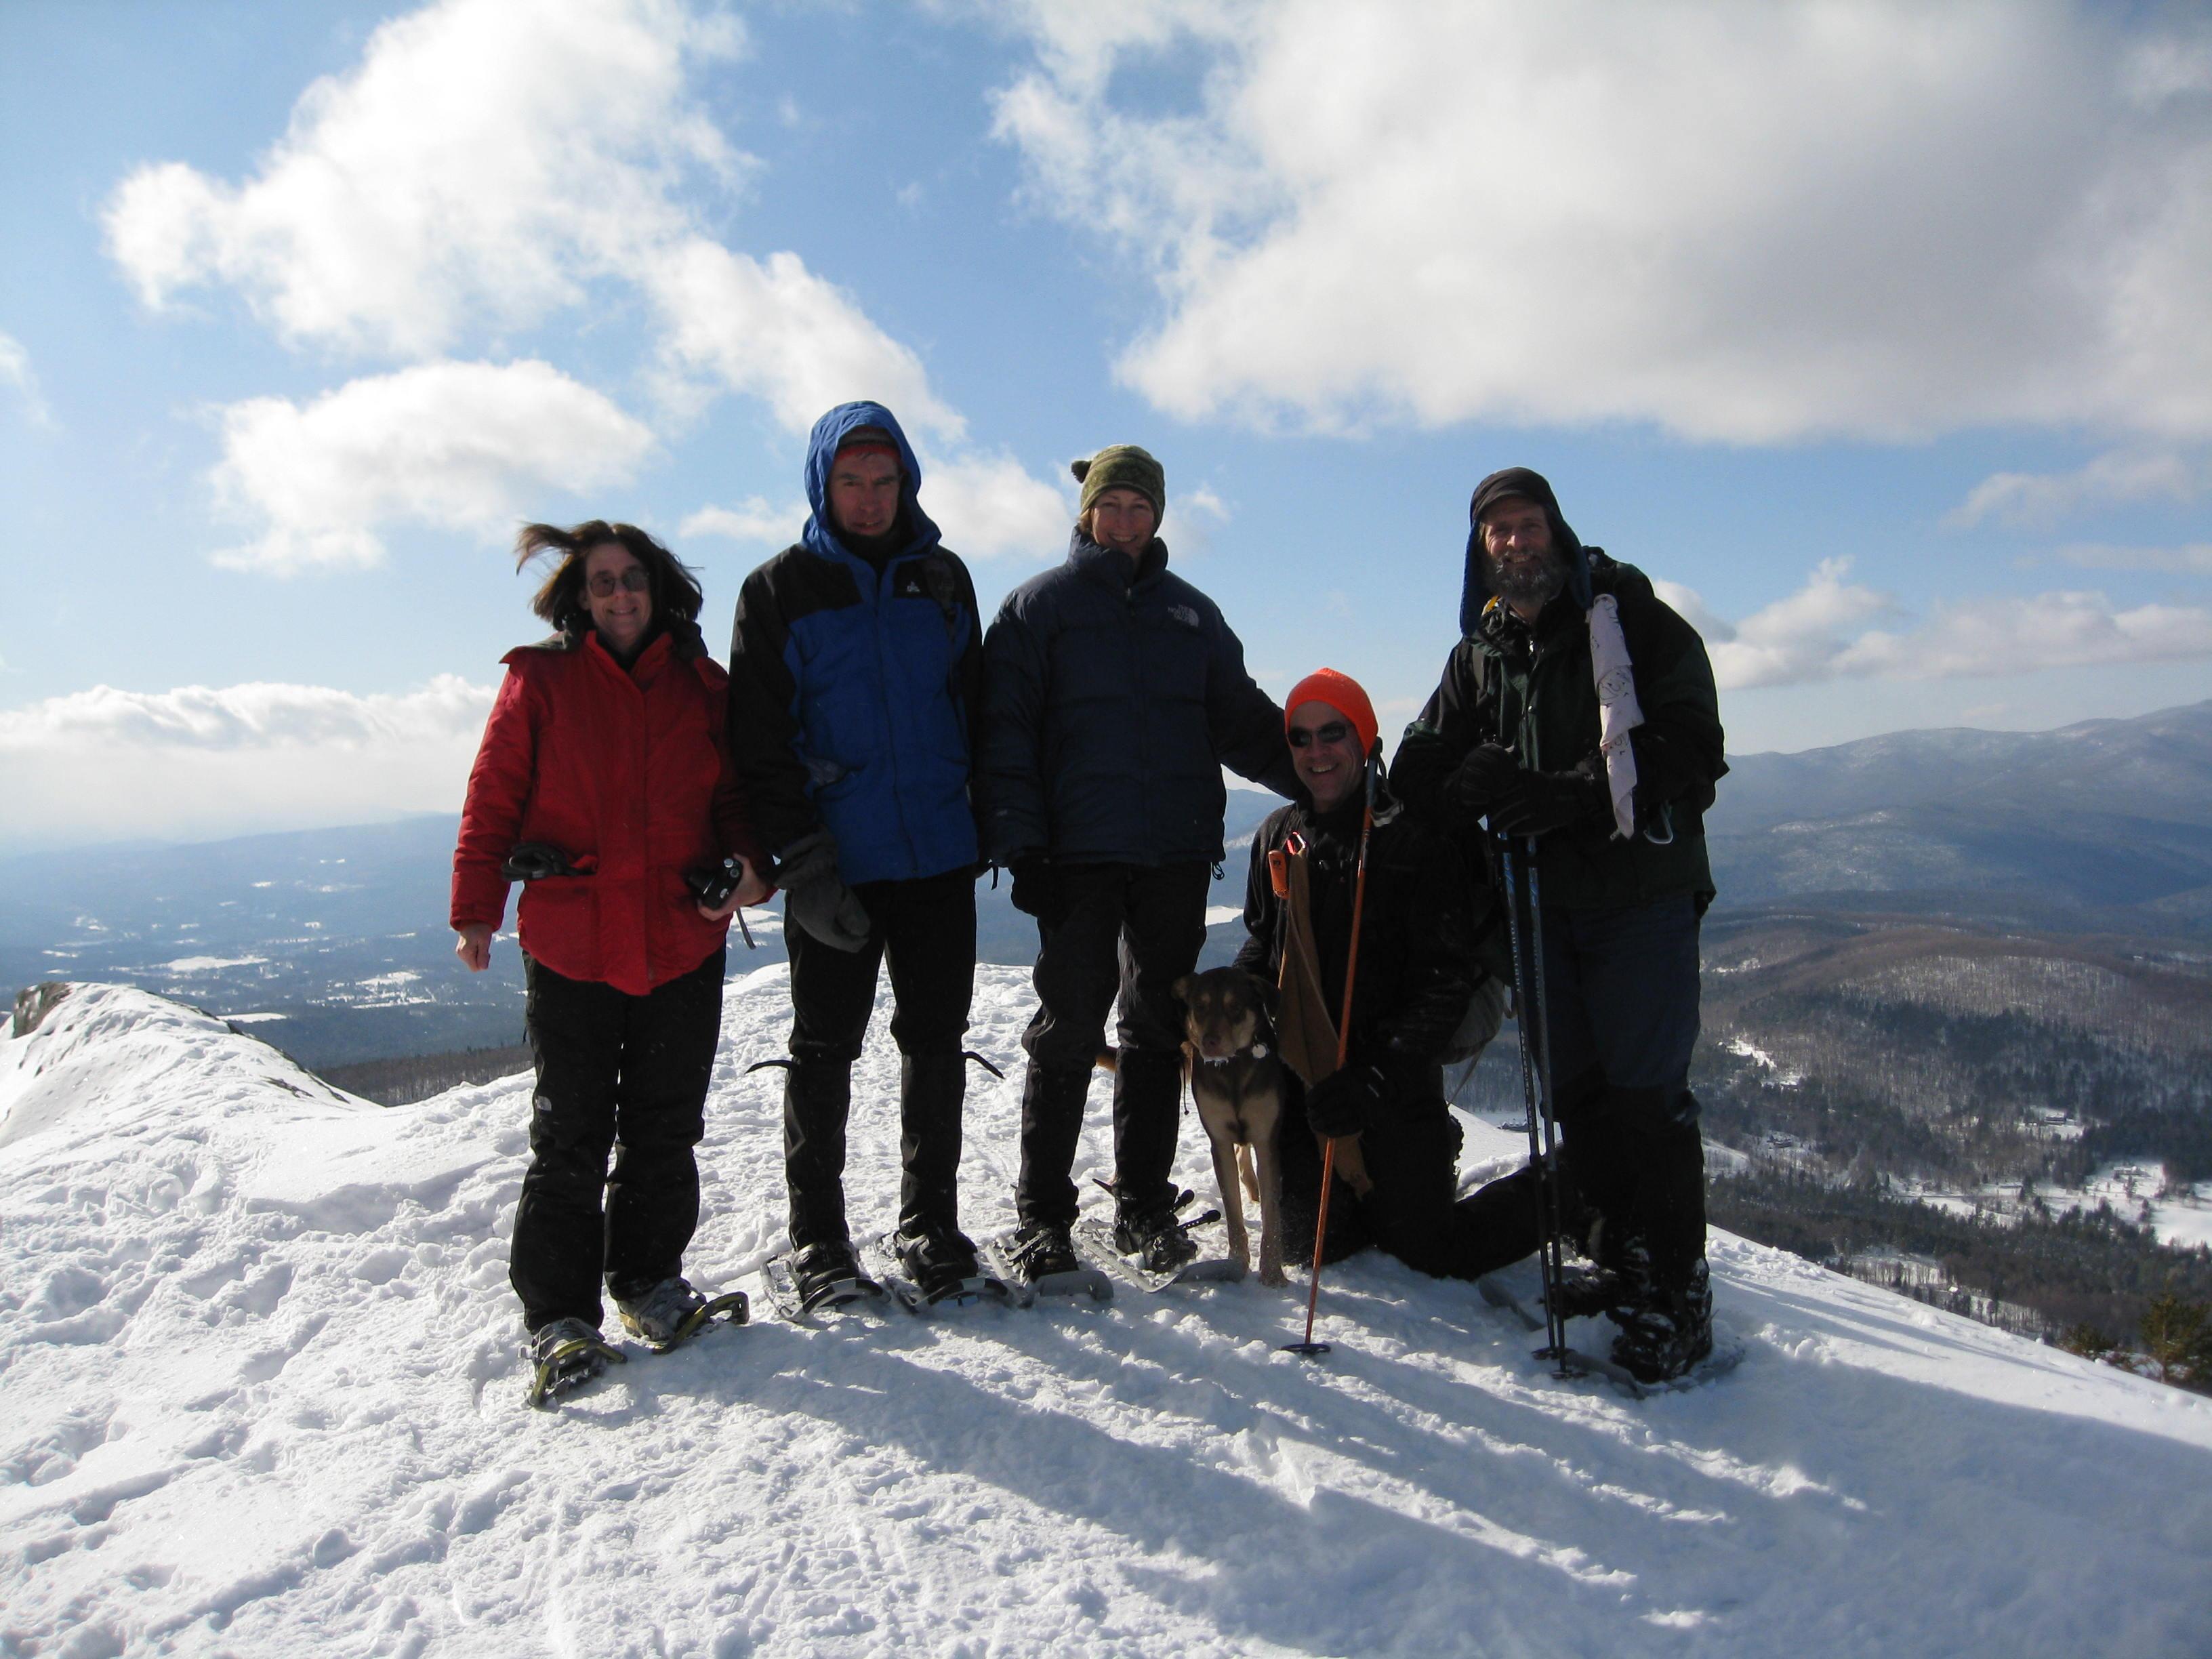 suzanne-daningburgs-stowe-pinnacle-hike-of-1-31-2009